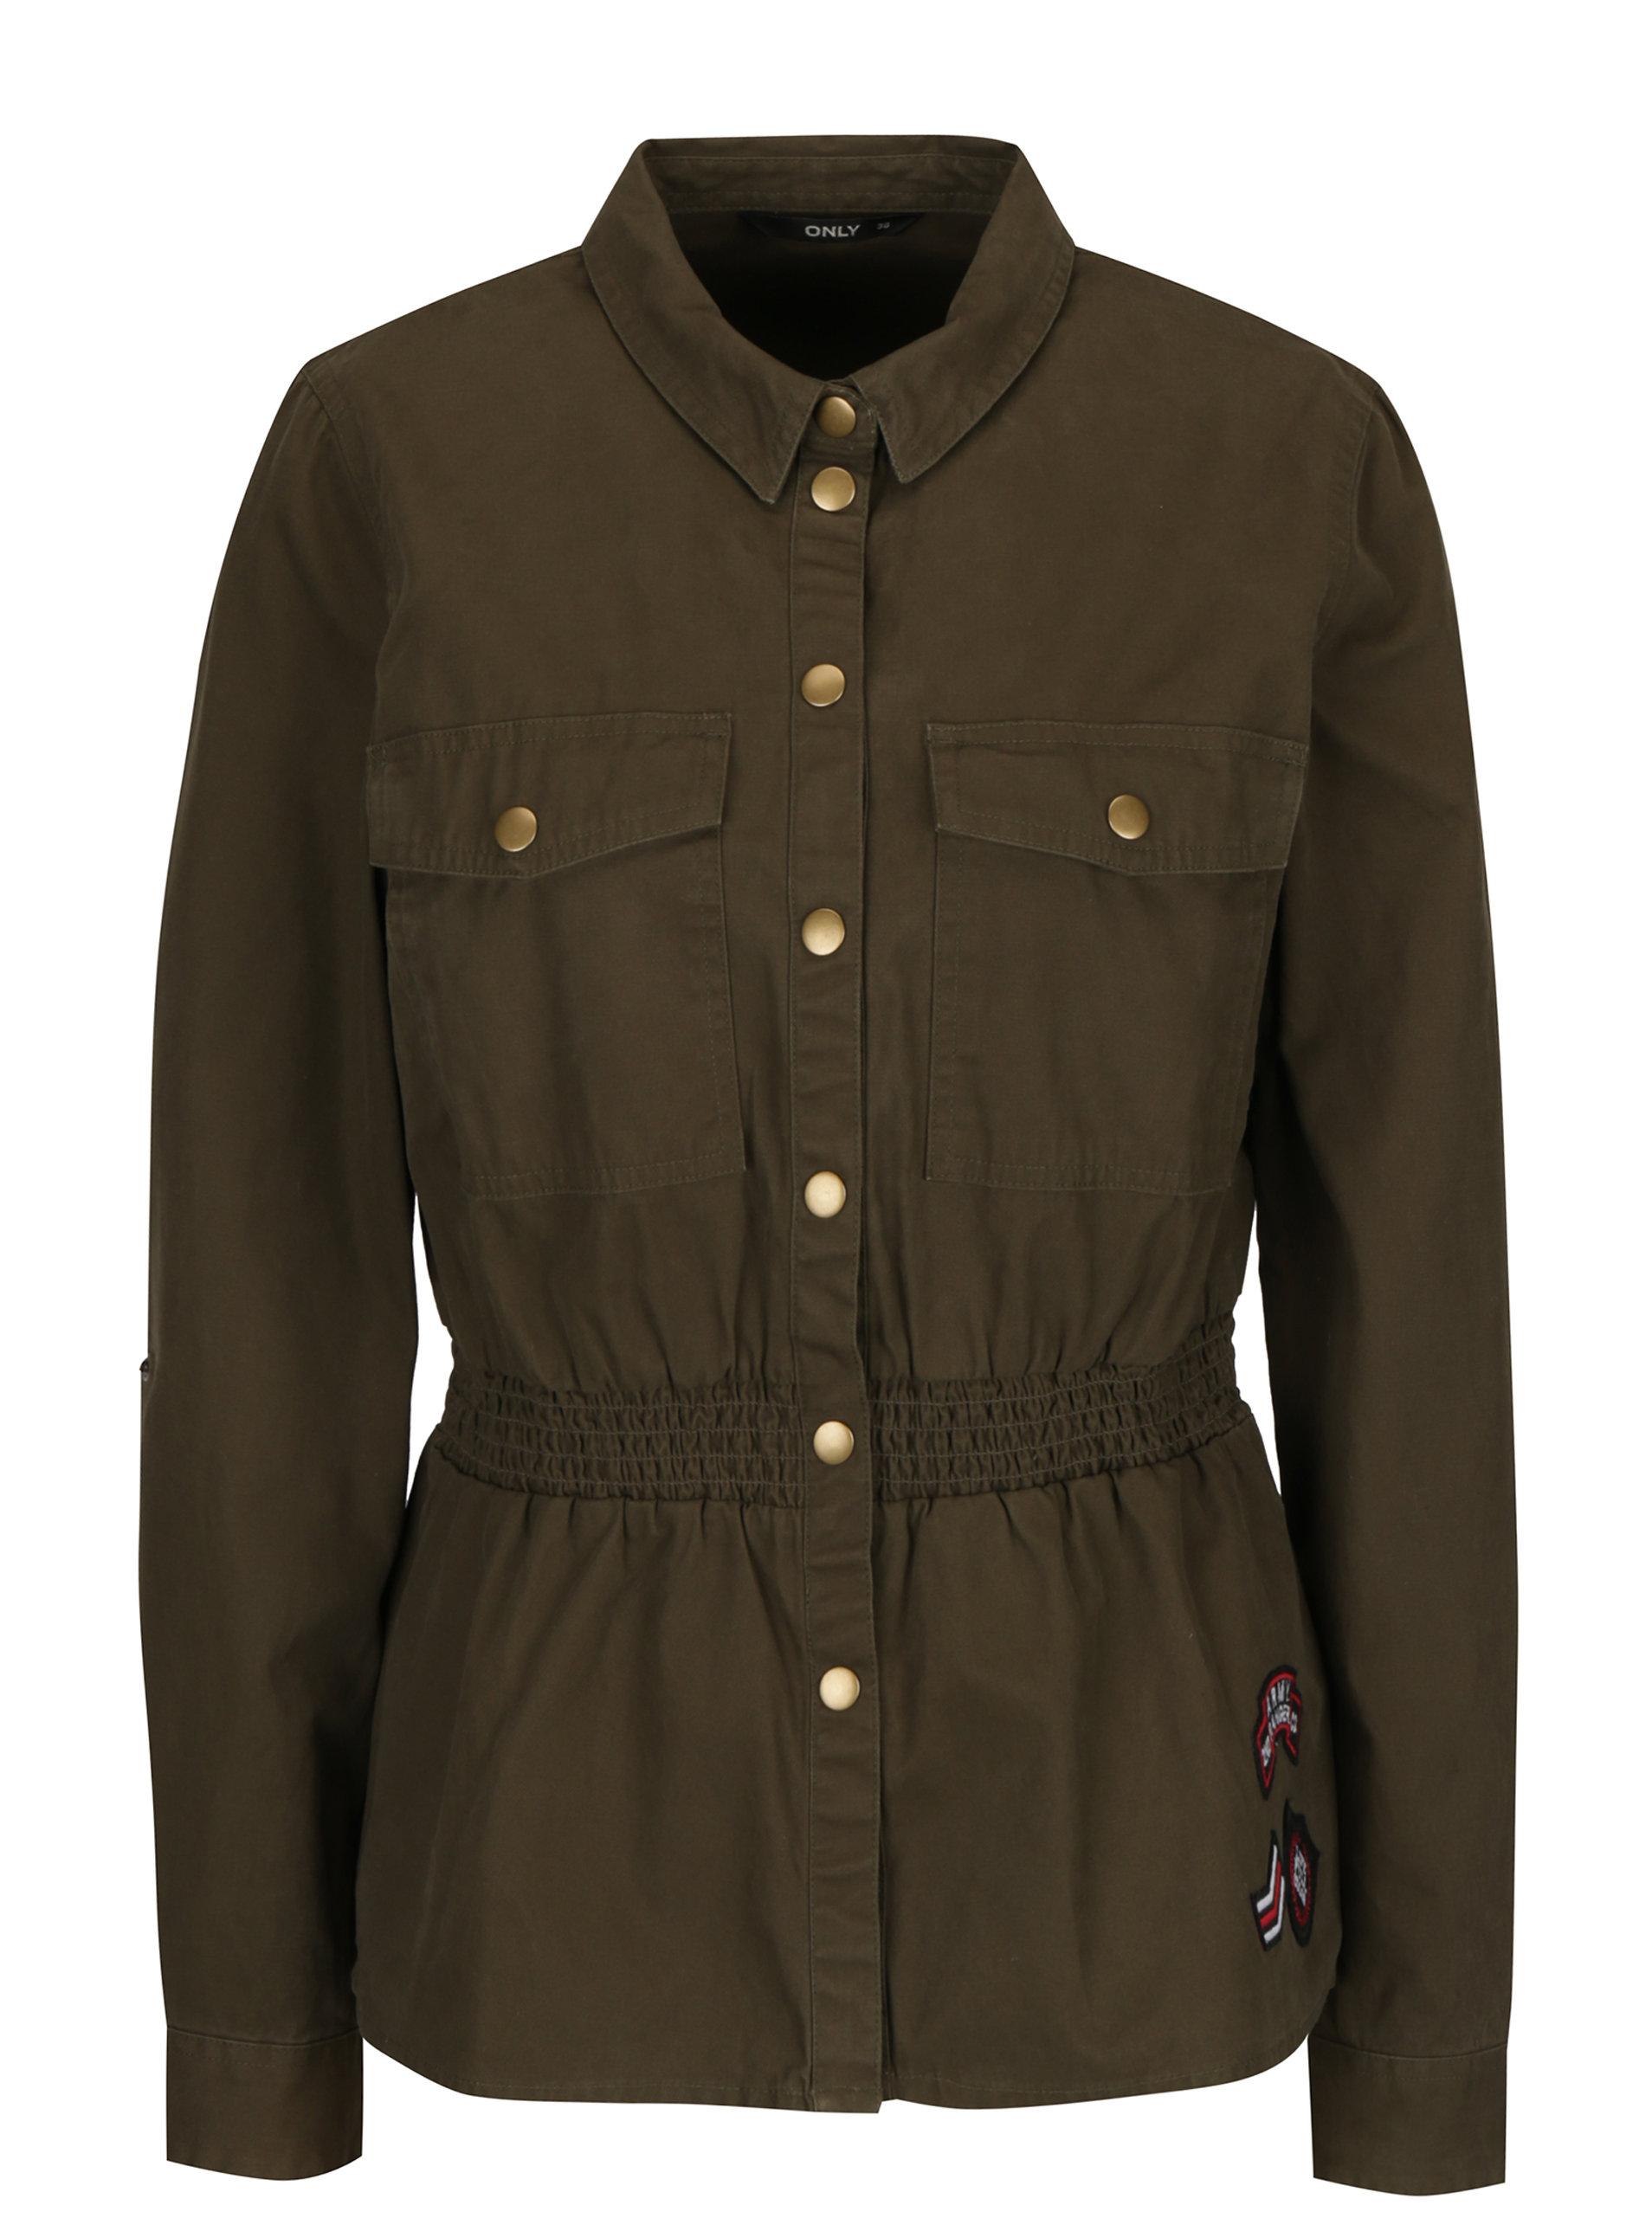 1a21910927 Khaki džínová lehká bunda s nášivkami ONLY Armor ...